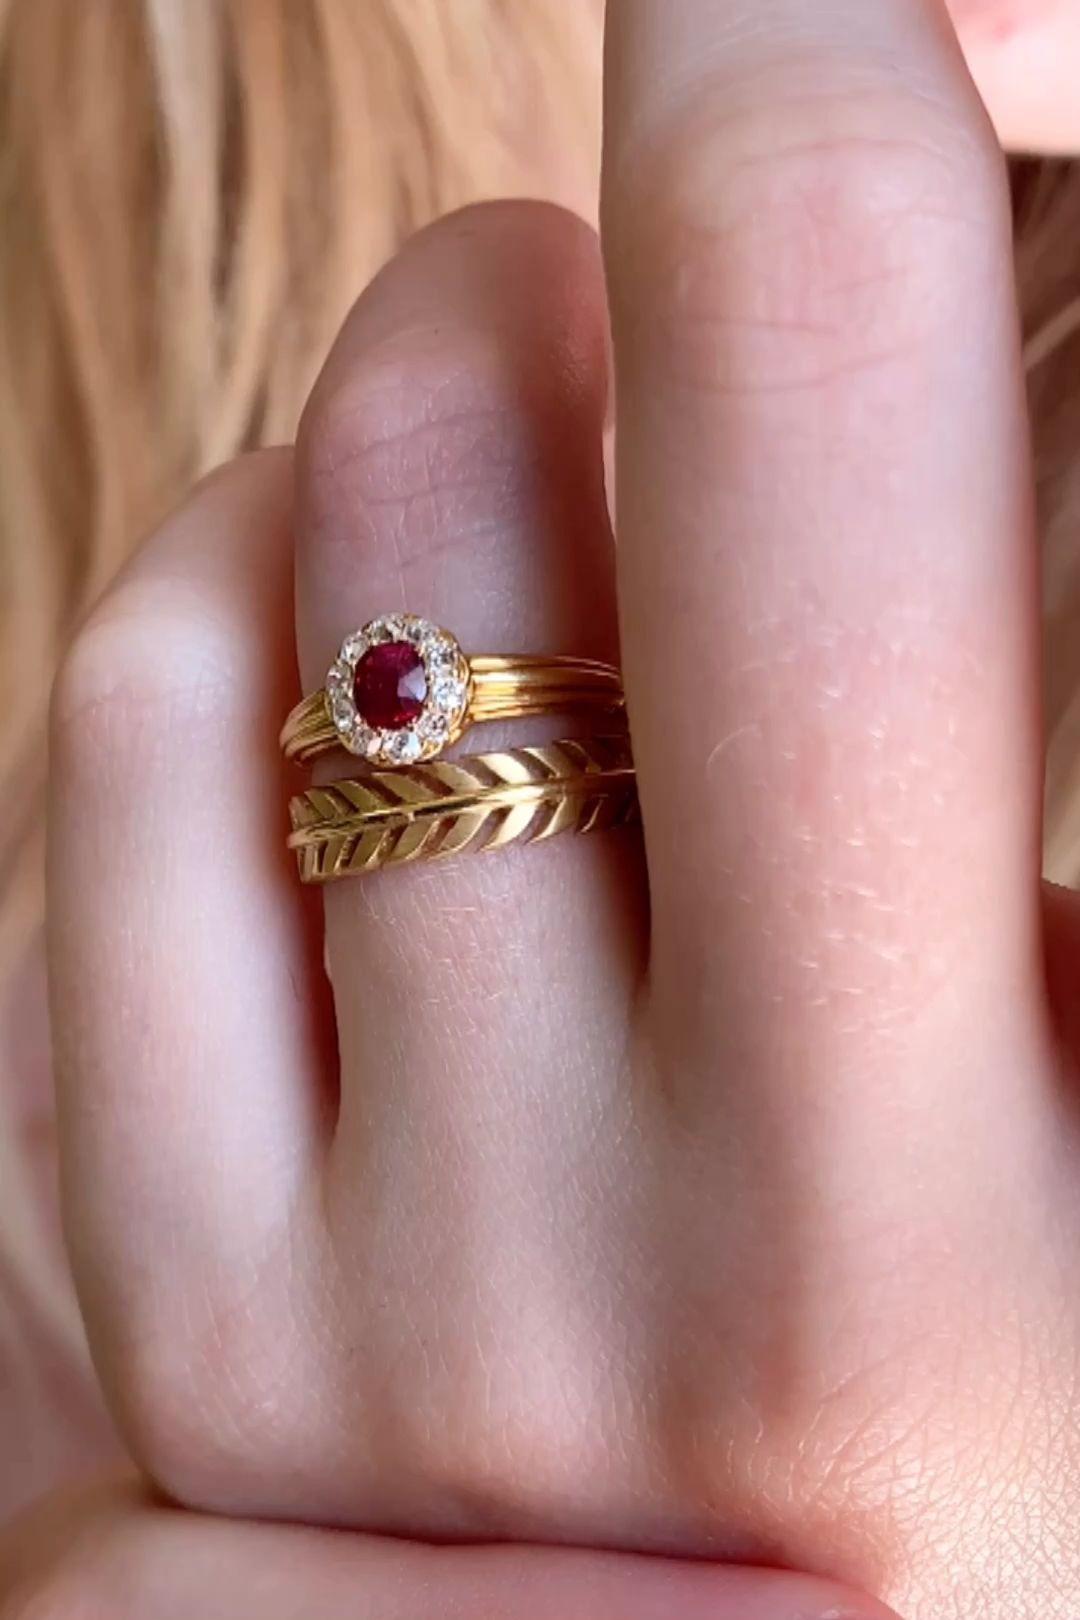 EDWARDIAN RUBY AND DIAMOND VINTAGE RING | Erstwhil